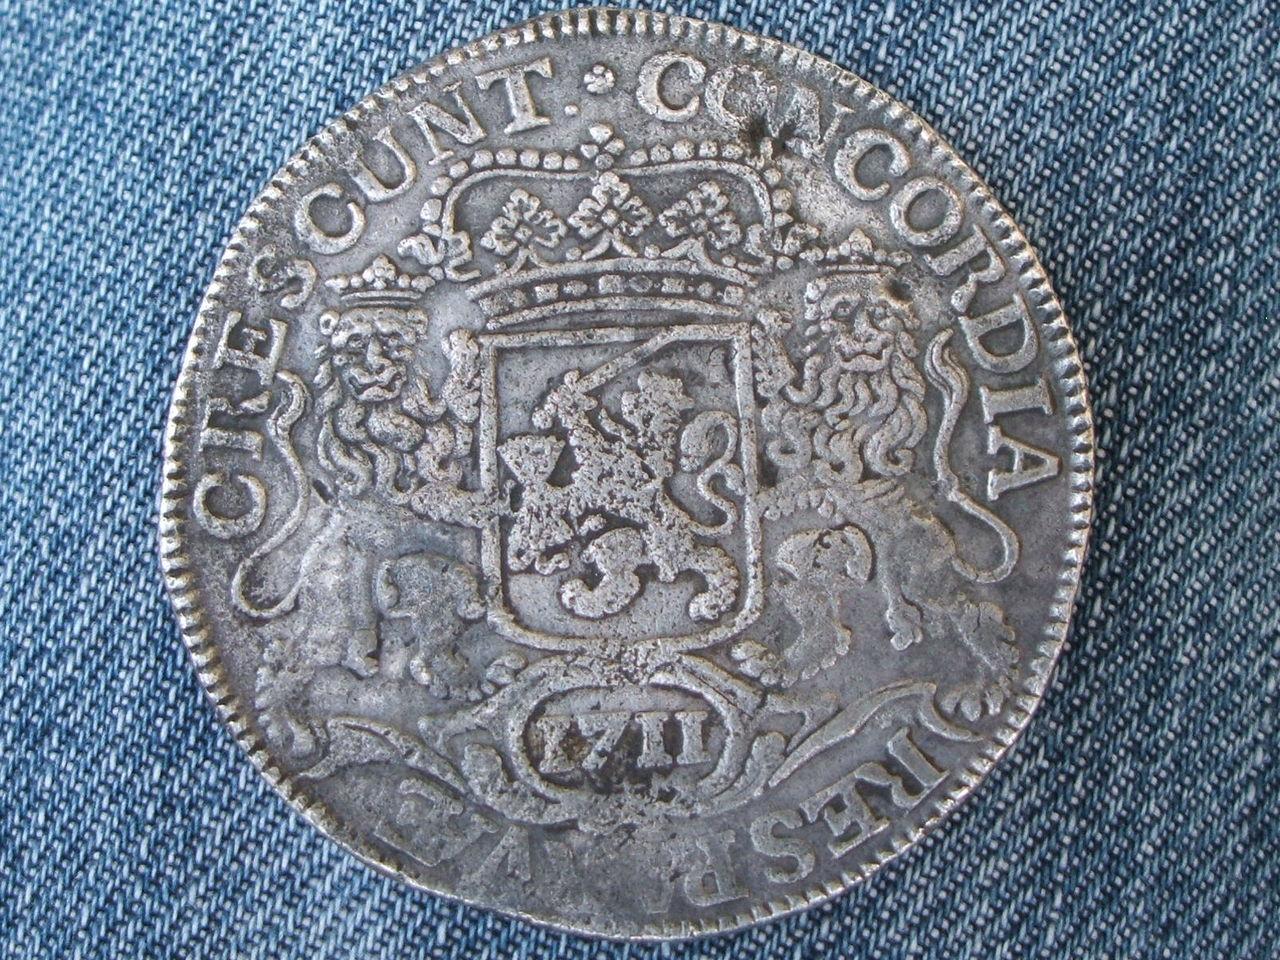 1 Ducaton. Holanda. 1711. Utrecht  31_60_gramos_diametro_38_15